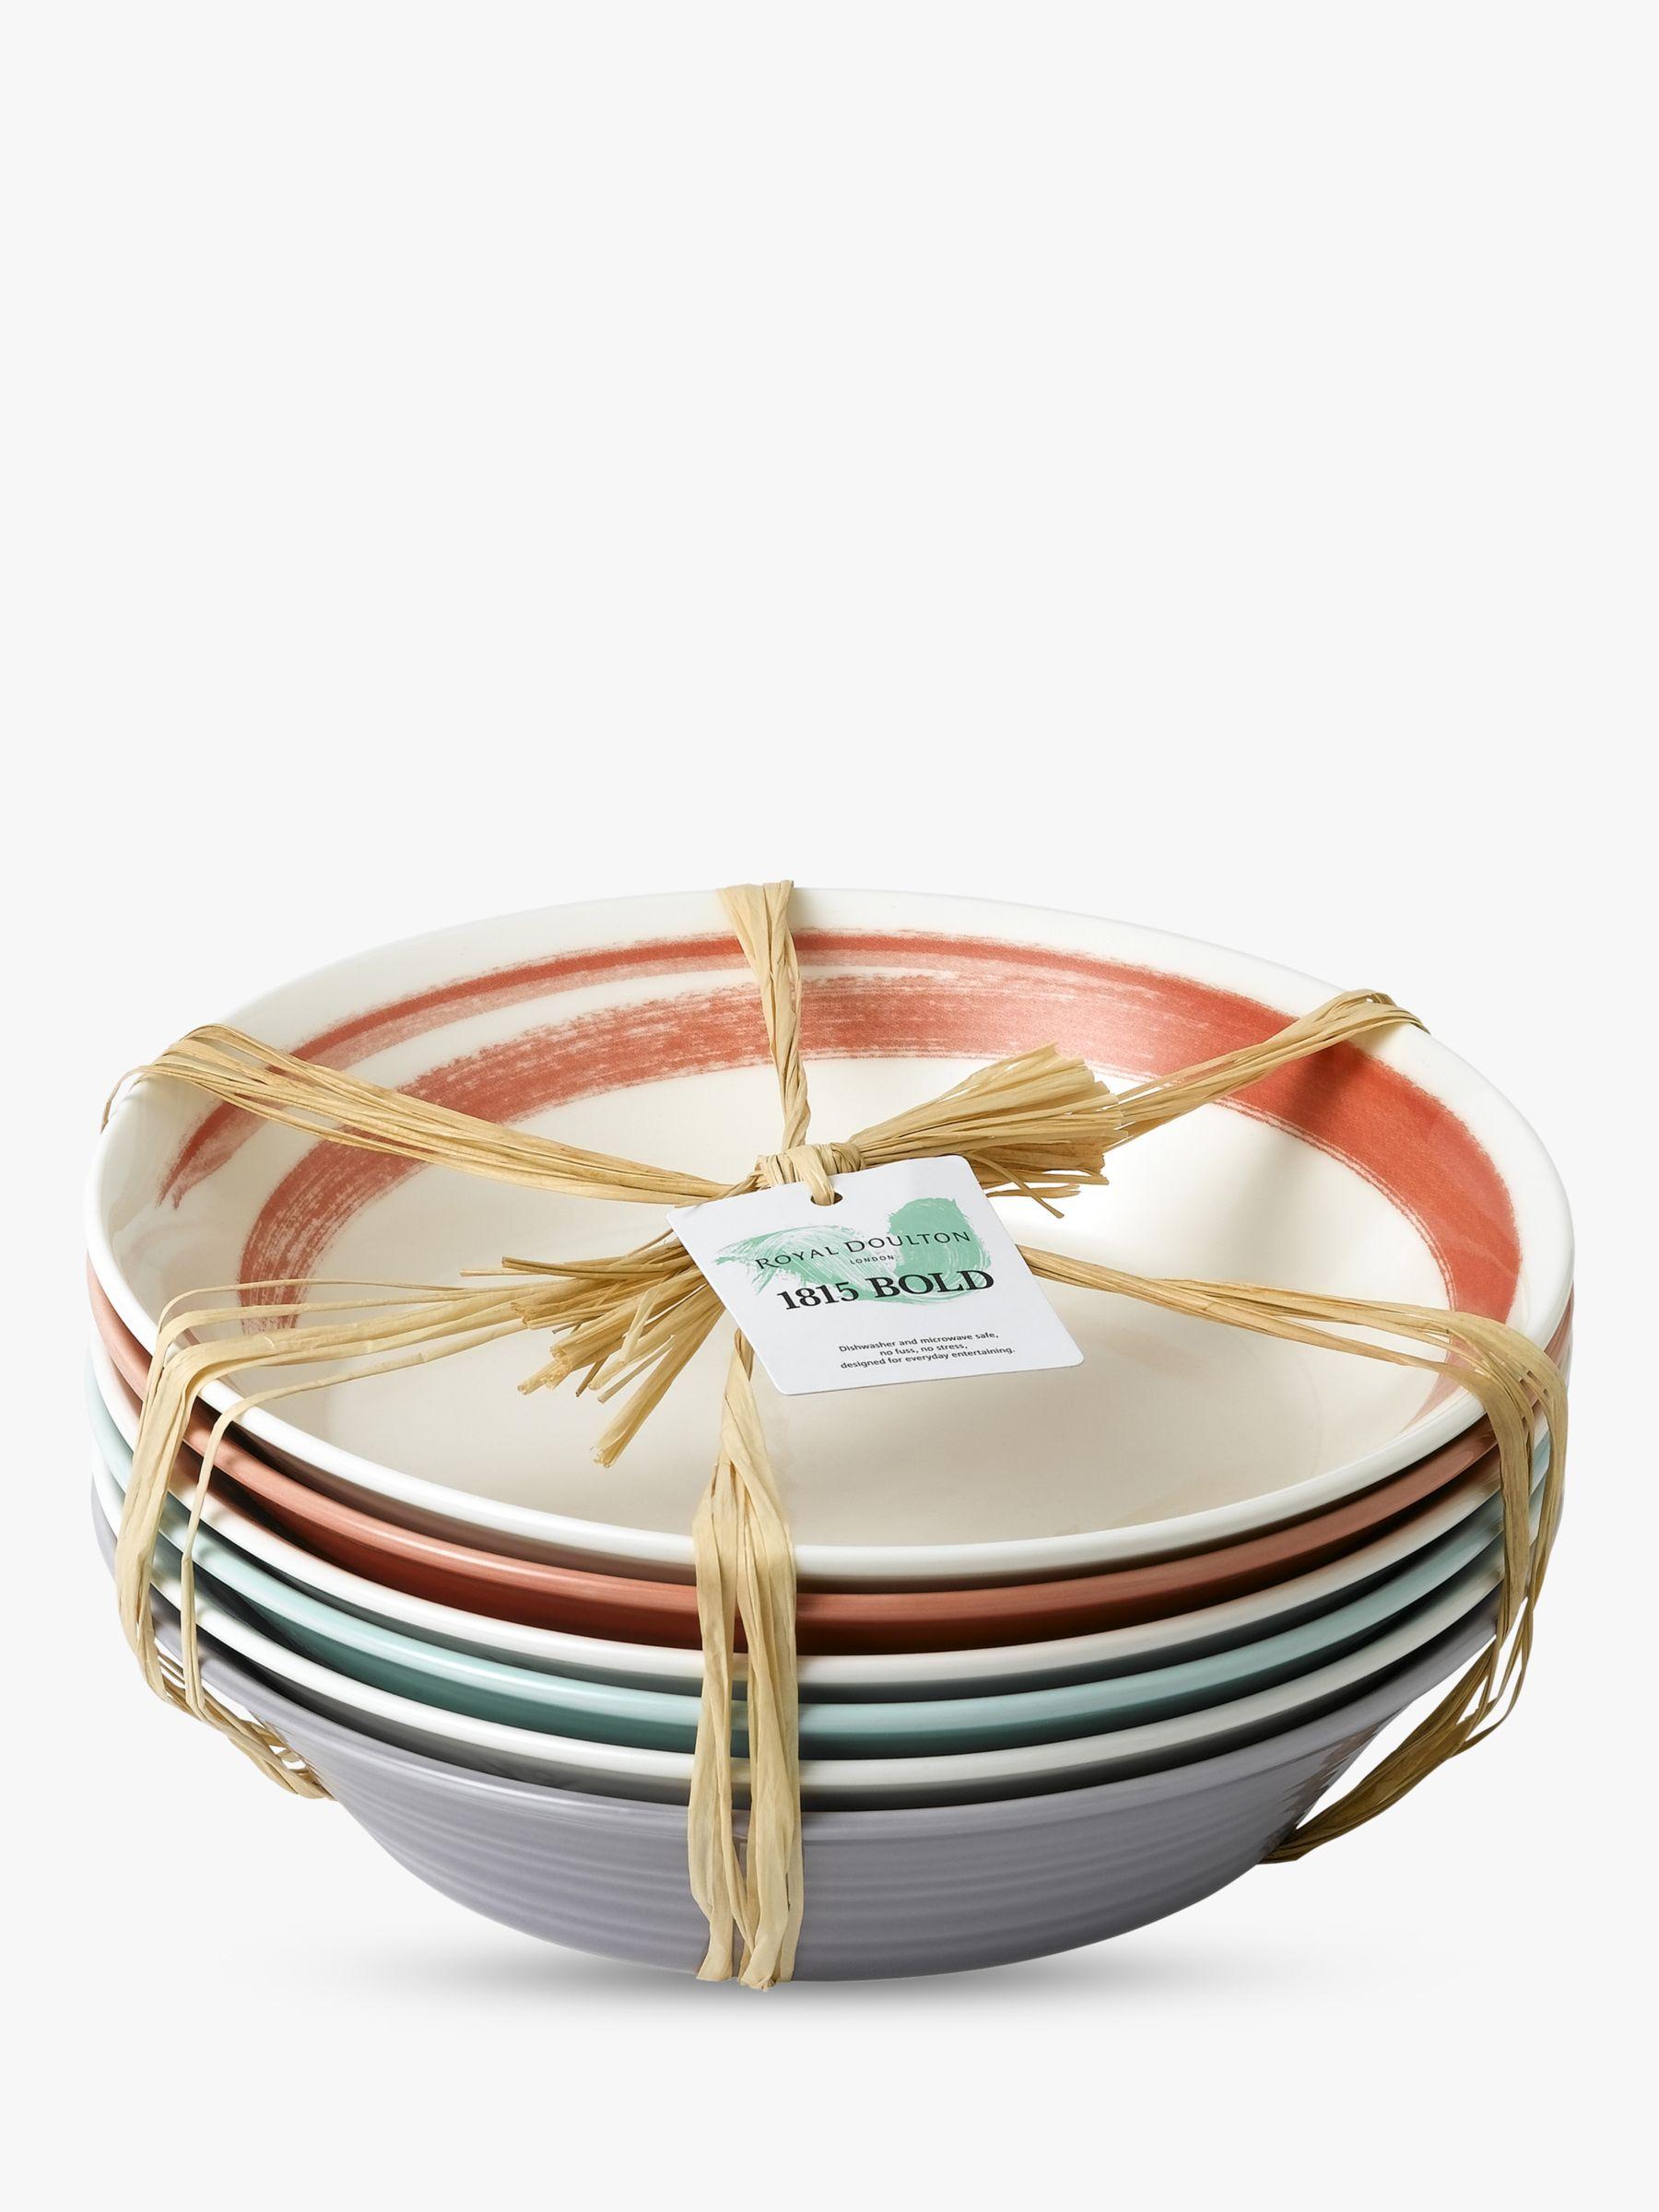 Royal Doulton Royal Doulton 1815 Bold Pasta Bowls, Set of 6, 23cm, Assorted